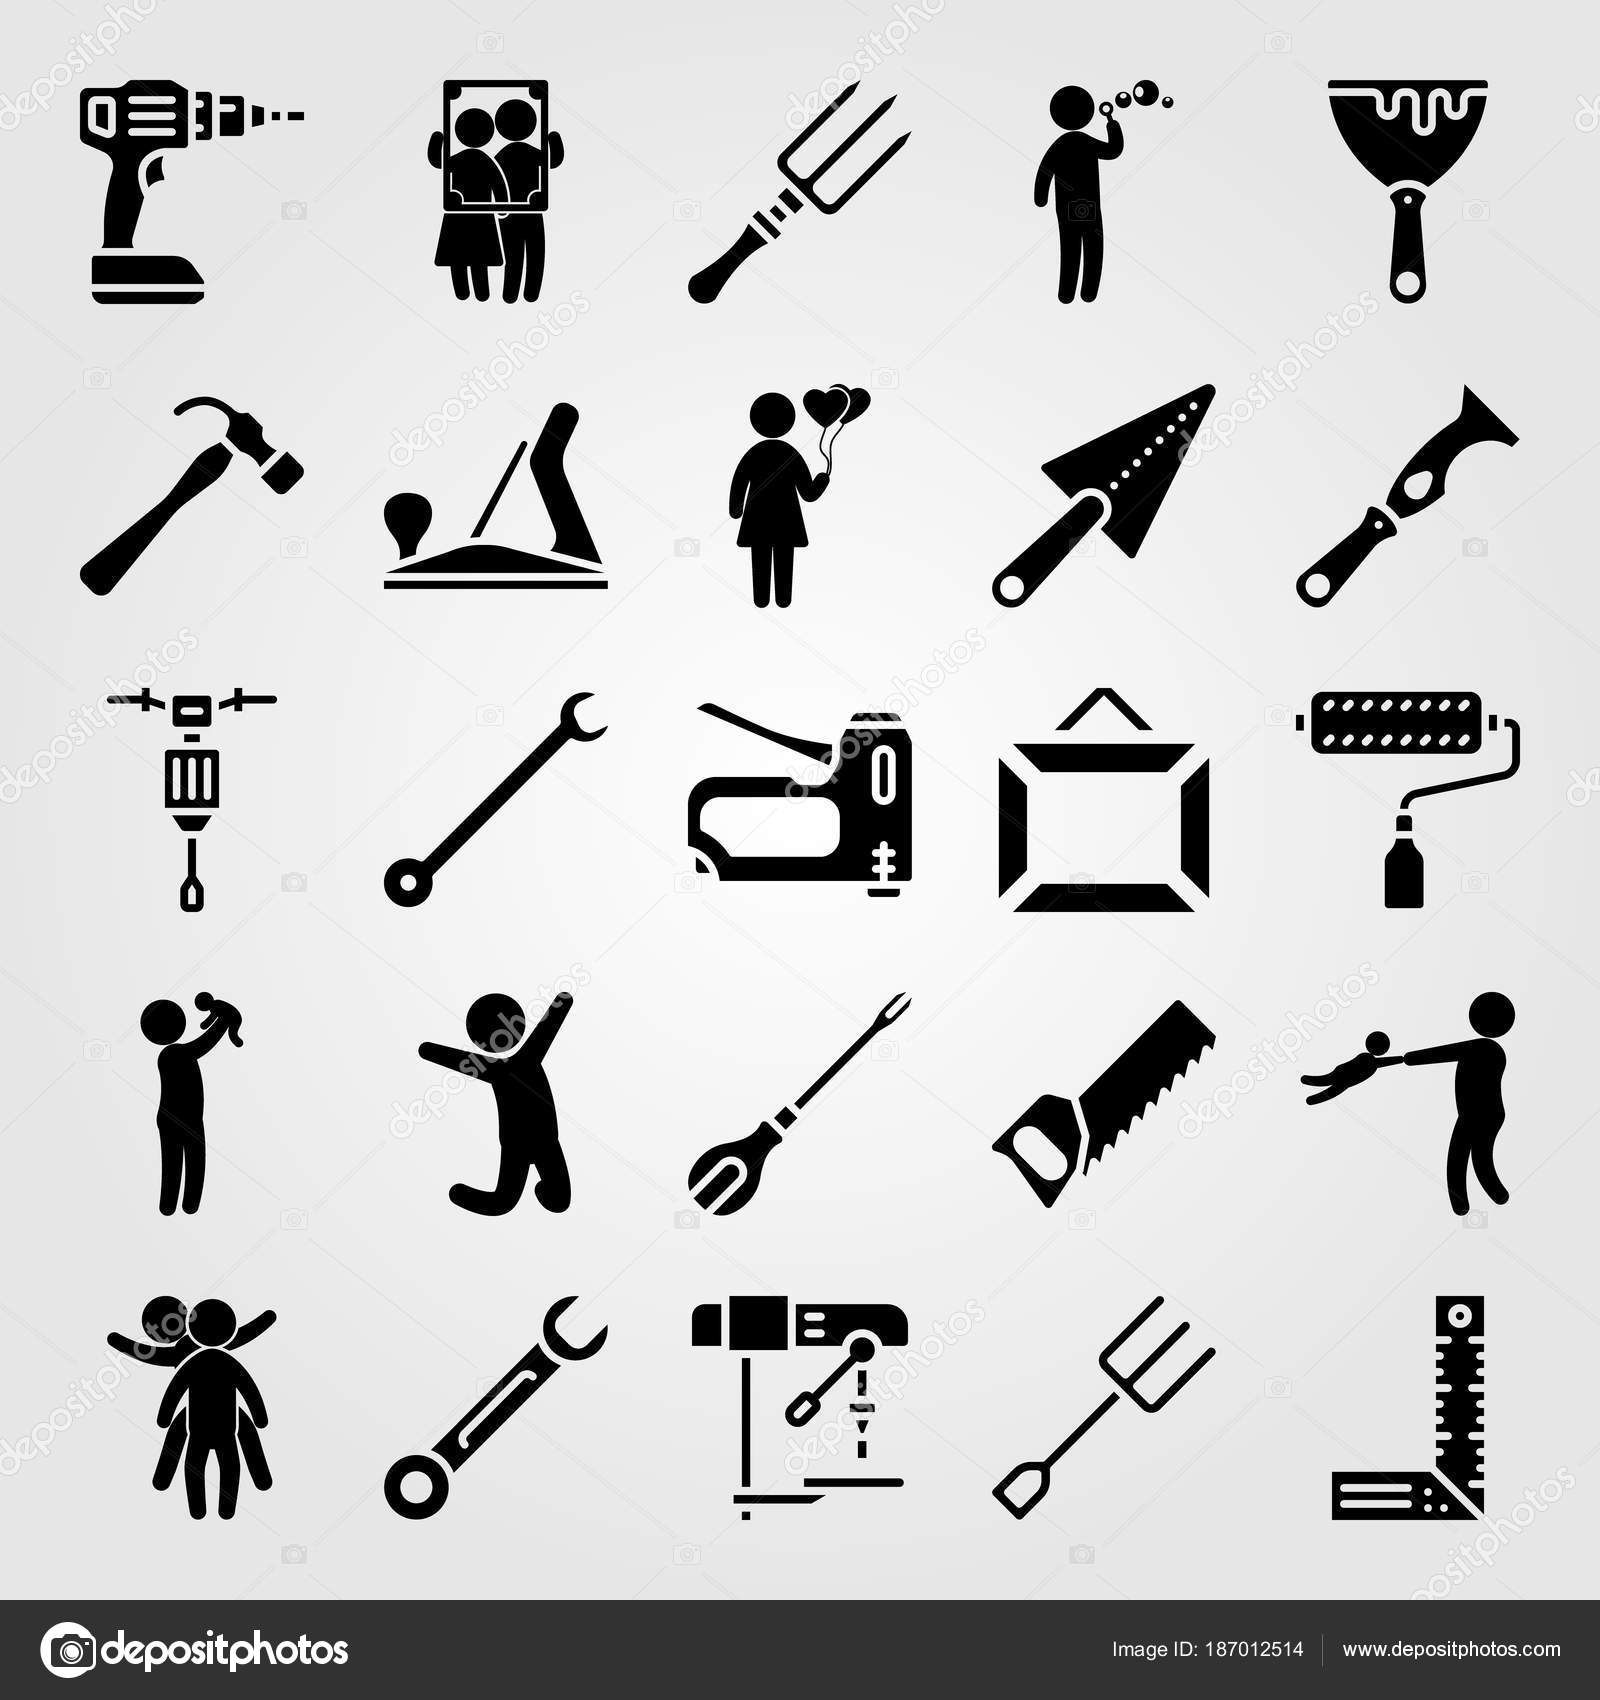 conjunto de ícones de ferramentas vetoriais rolo de pintura plano